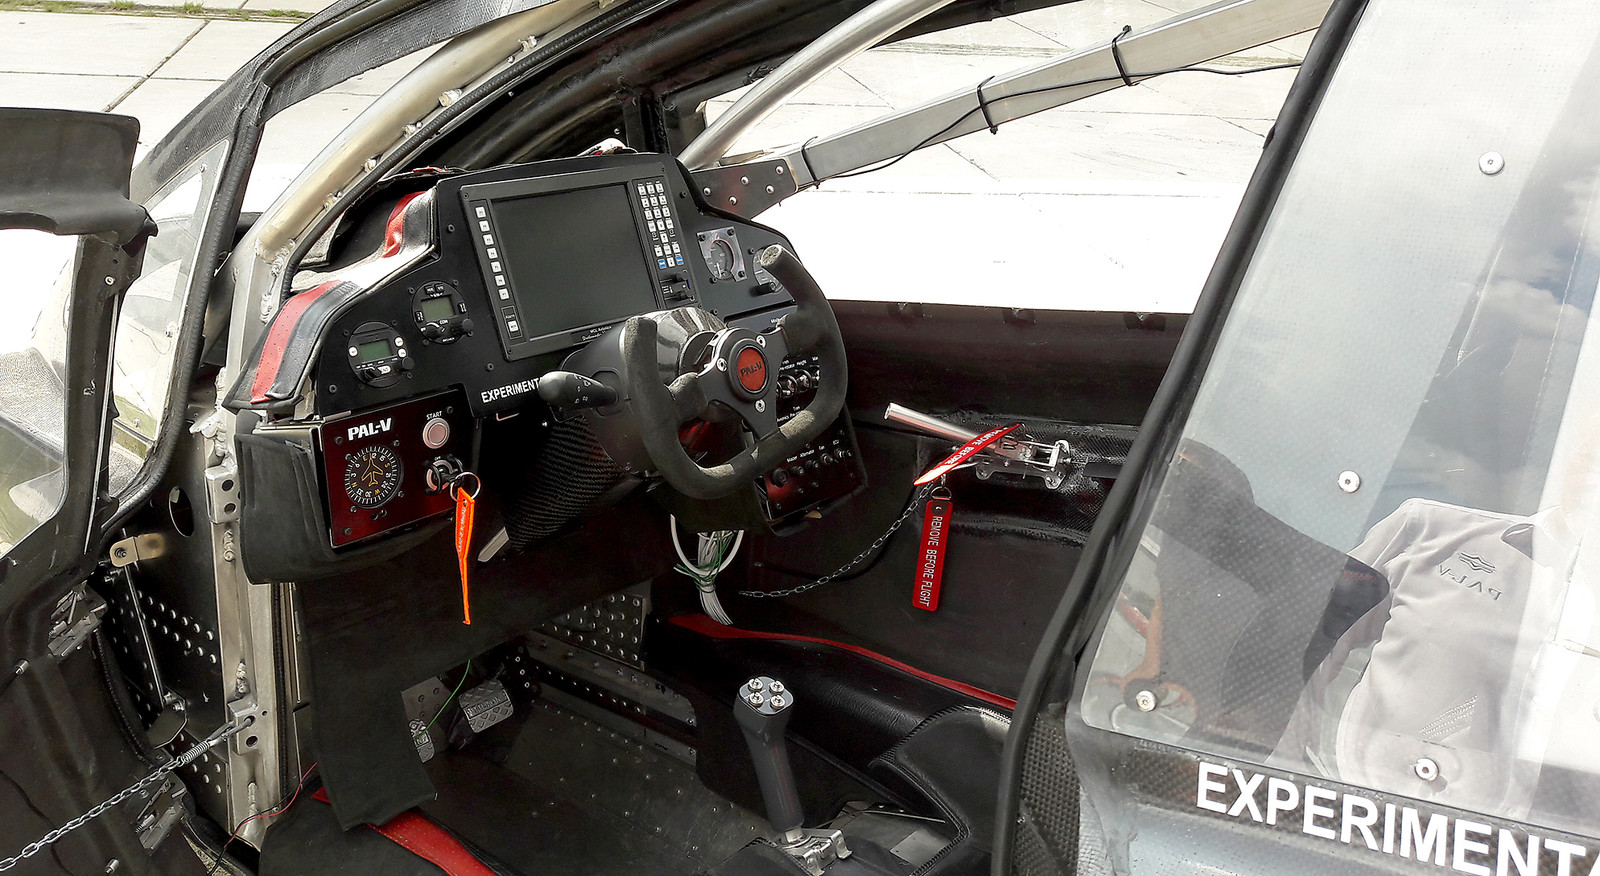 Cockpit van de gyrocopter.